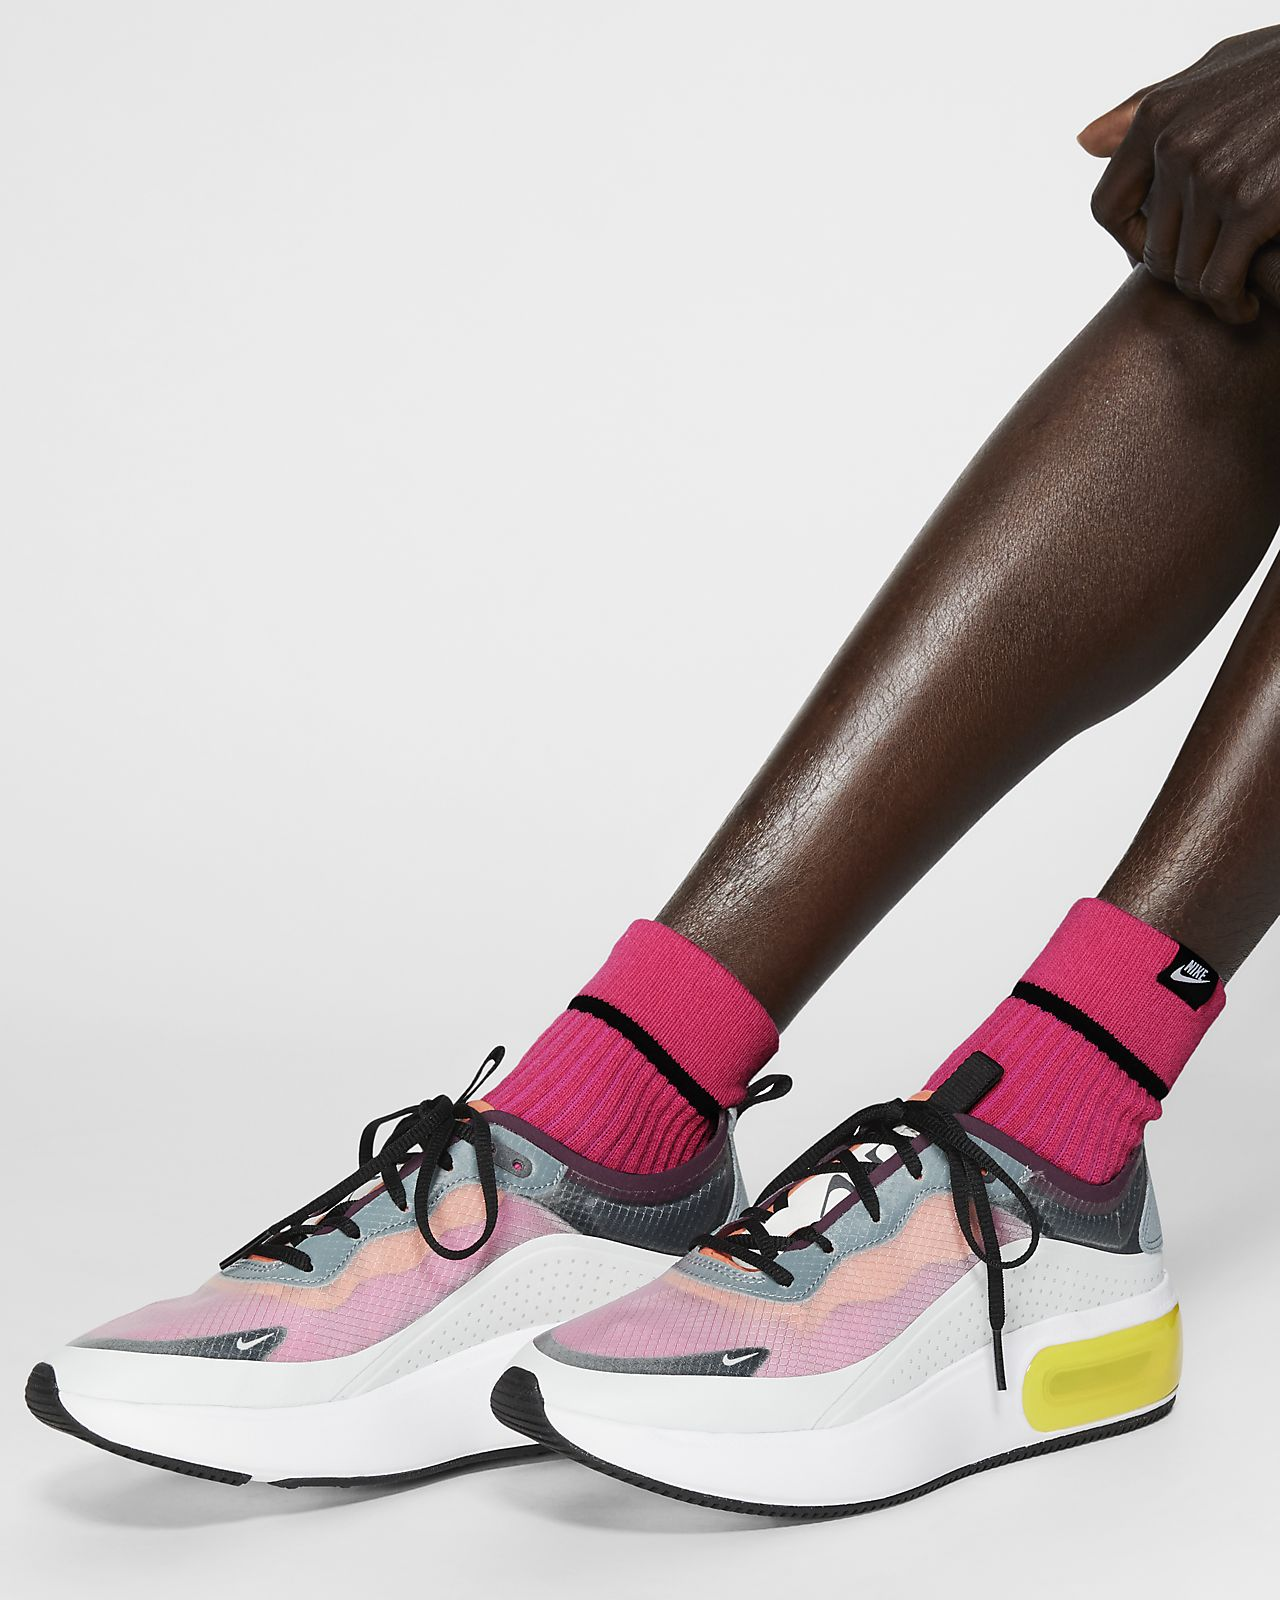 Nike SNKR Sox Ankle Socks (2 Pairs)